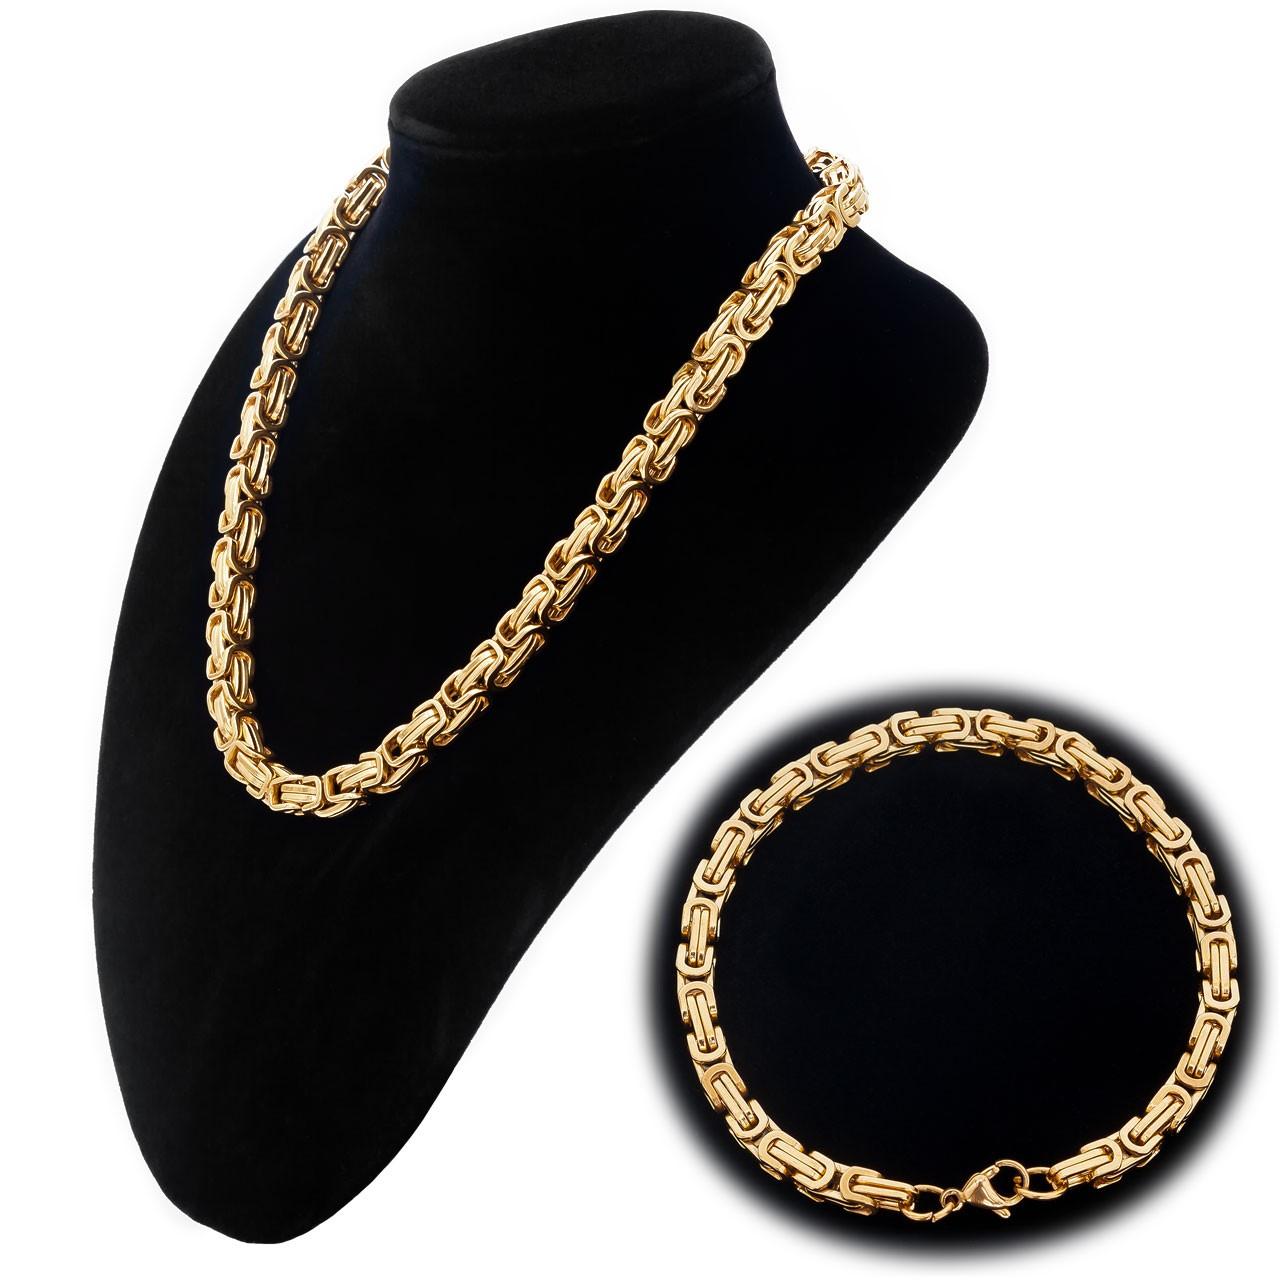 Byzantiner Königskette Armband Panzerkette Edelstahl Farbe gold